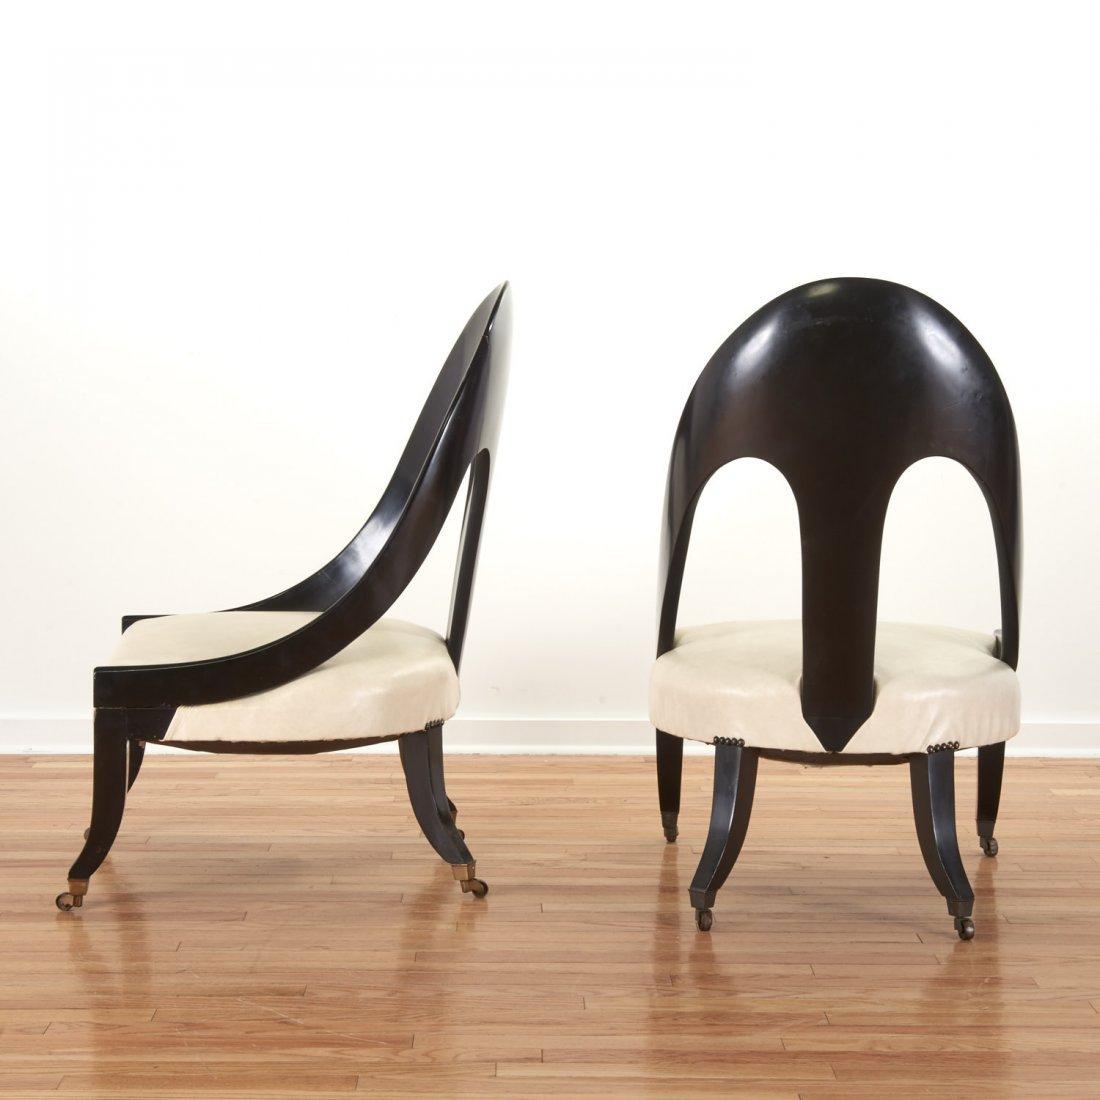 Pair Hollywood Regency spoon-back chairs - 2